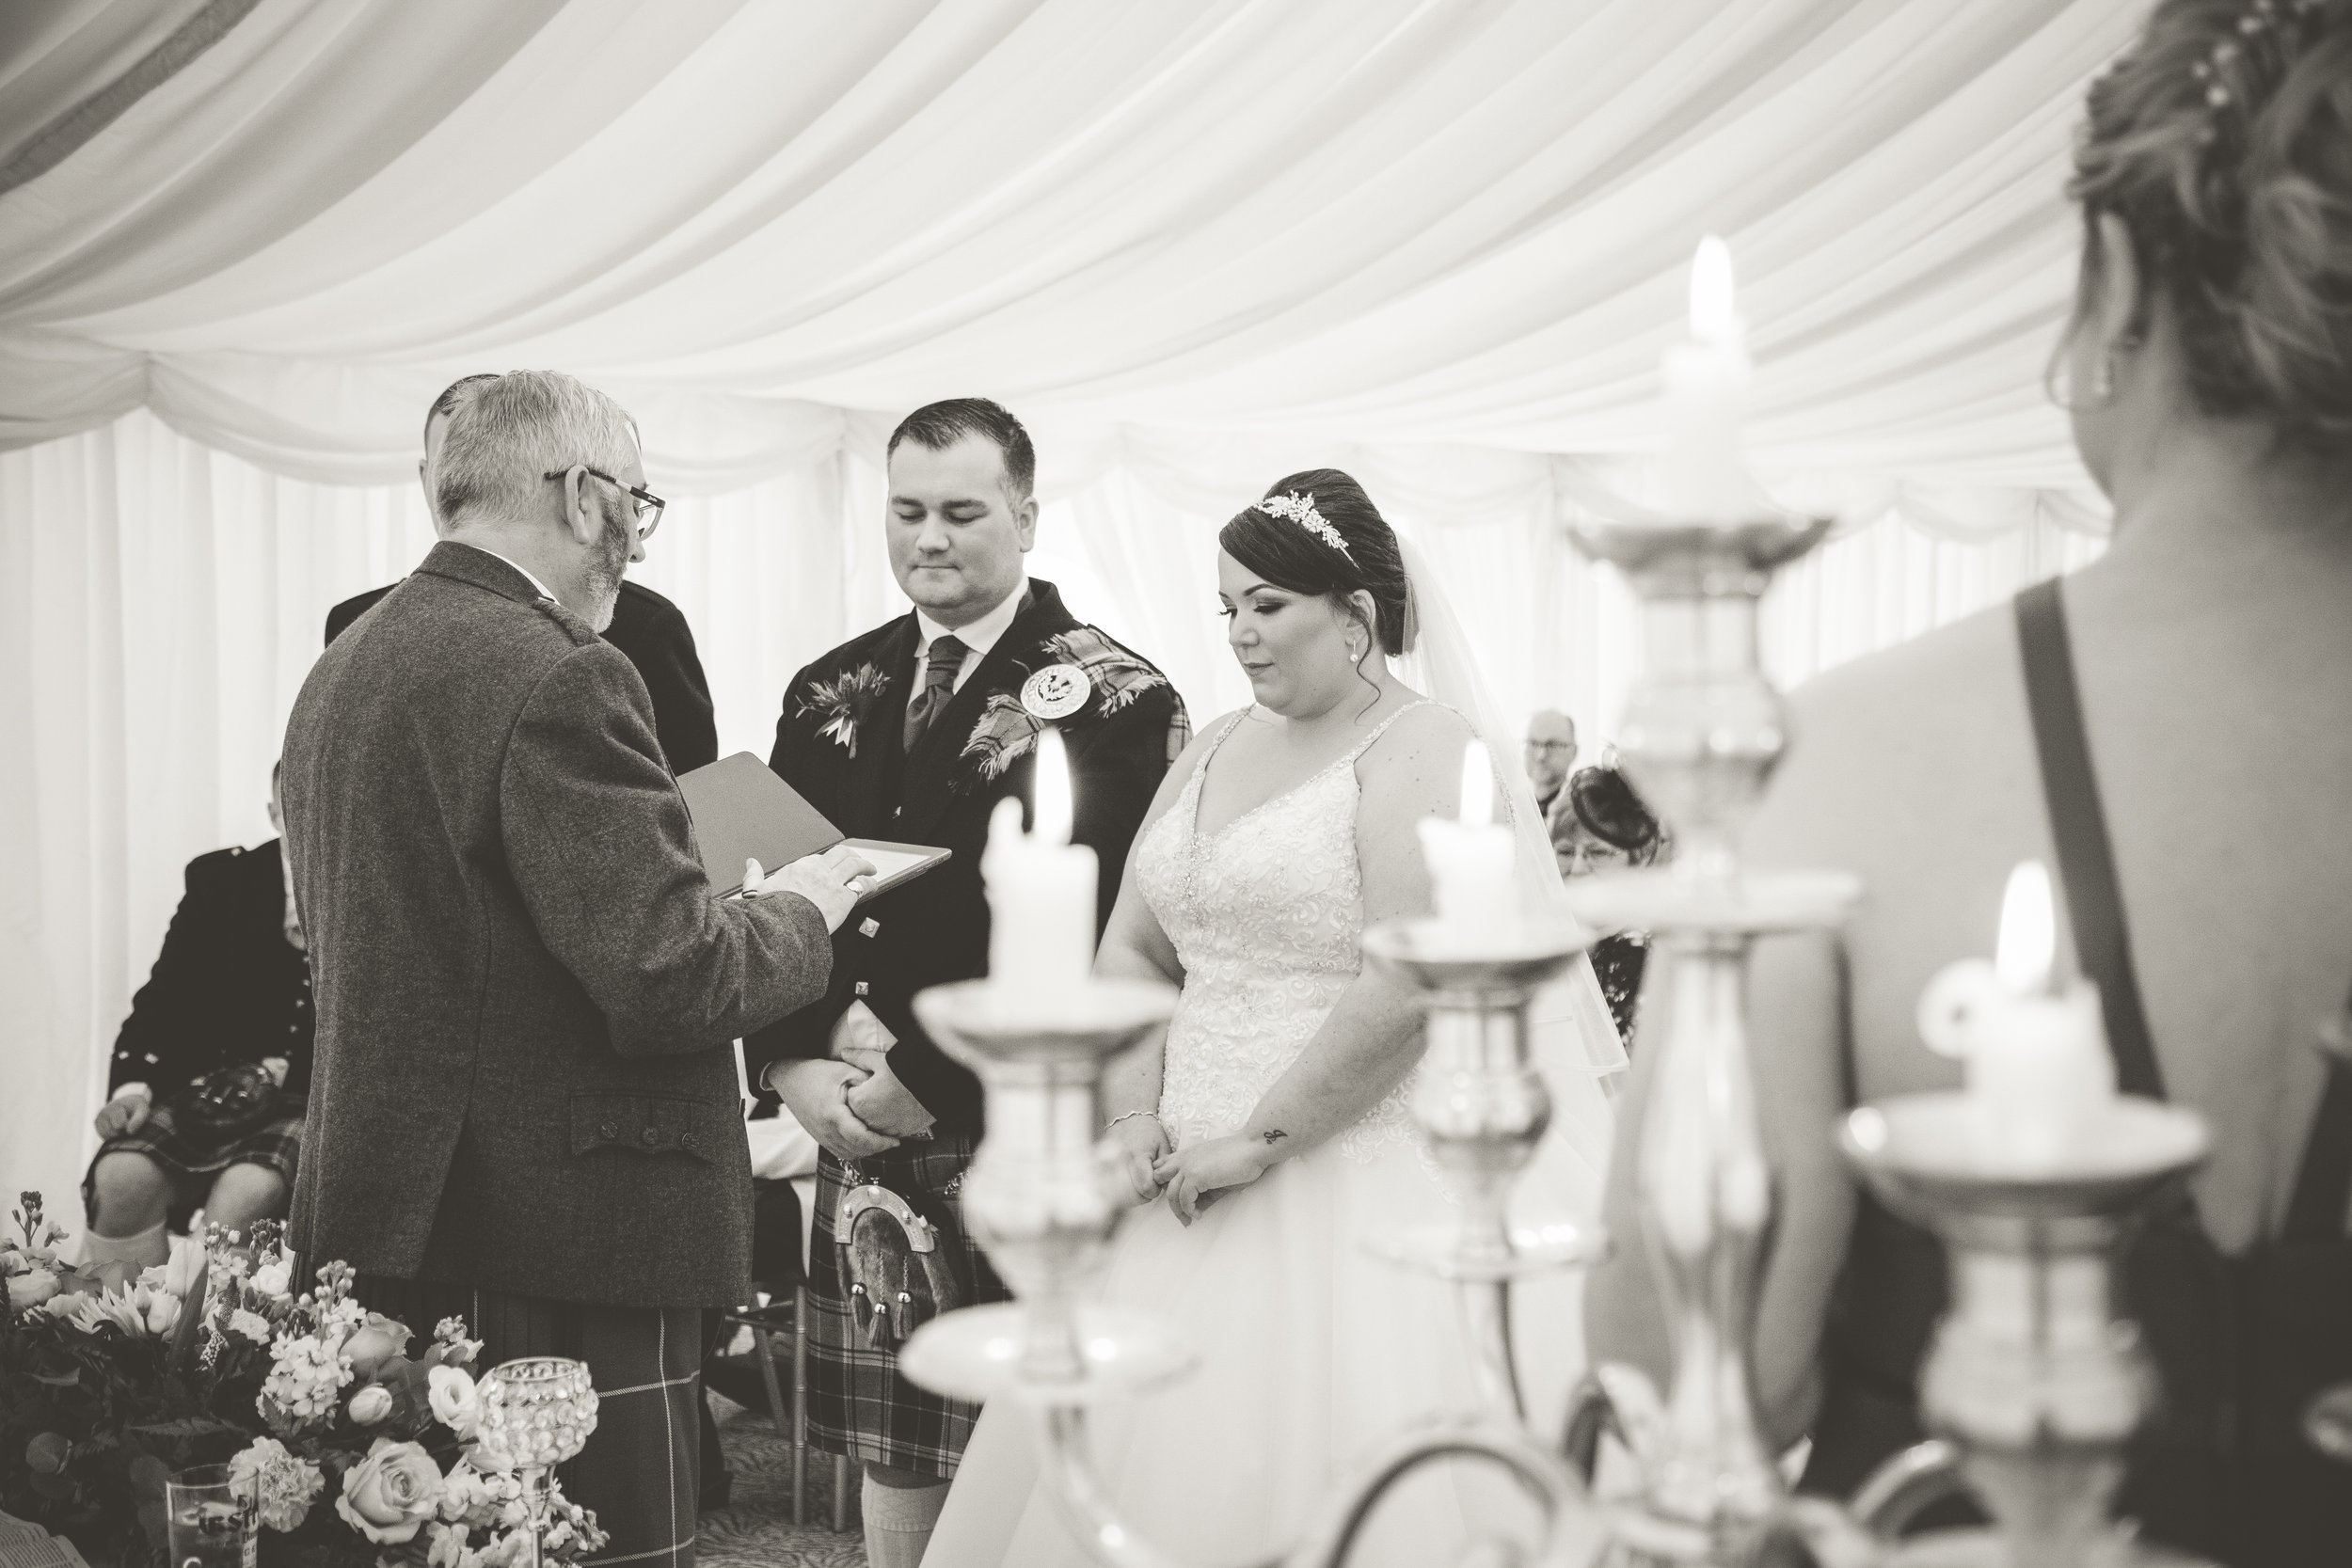 Mr&MrsBrown_080-2.jpg